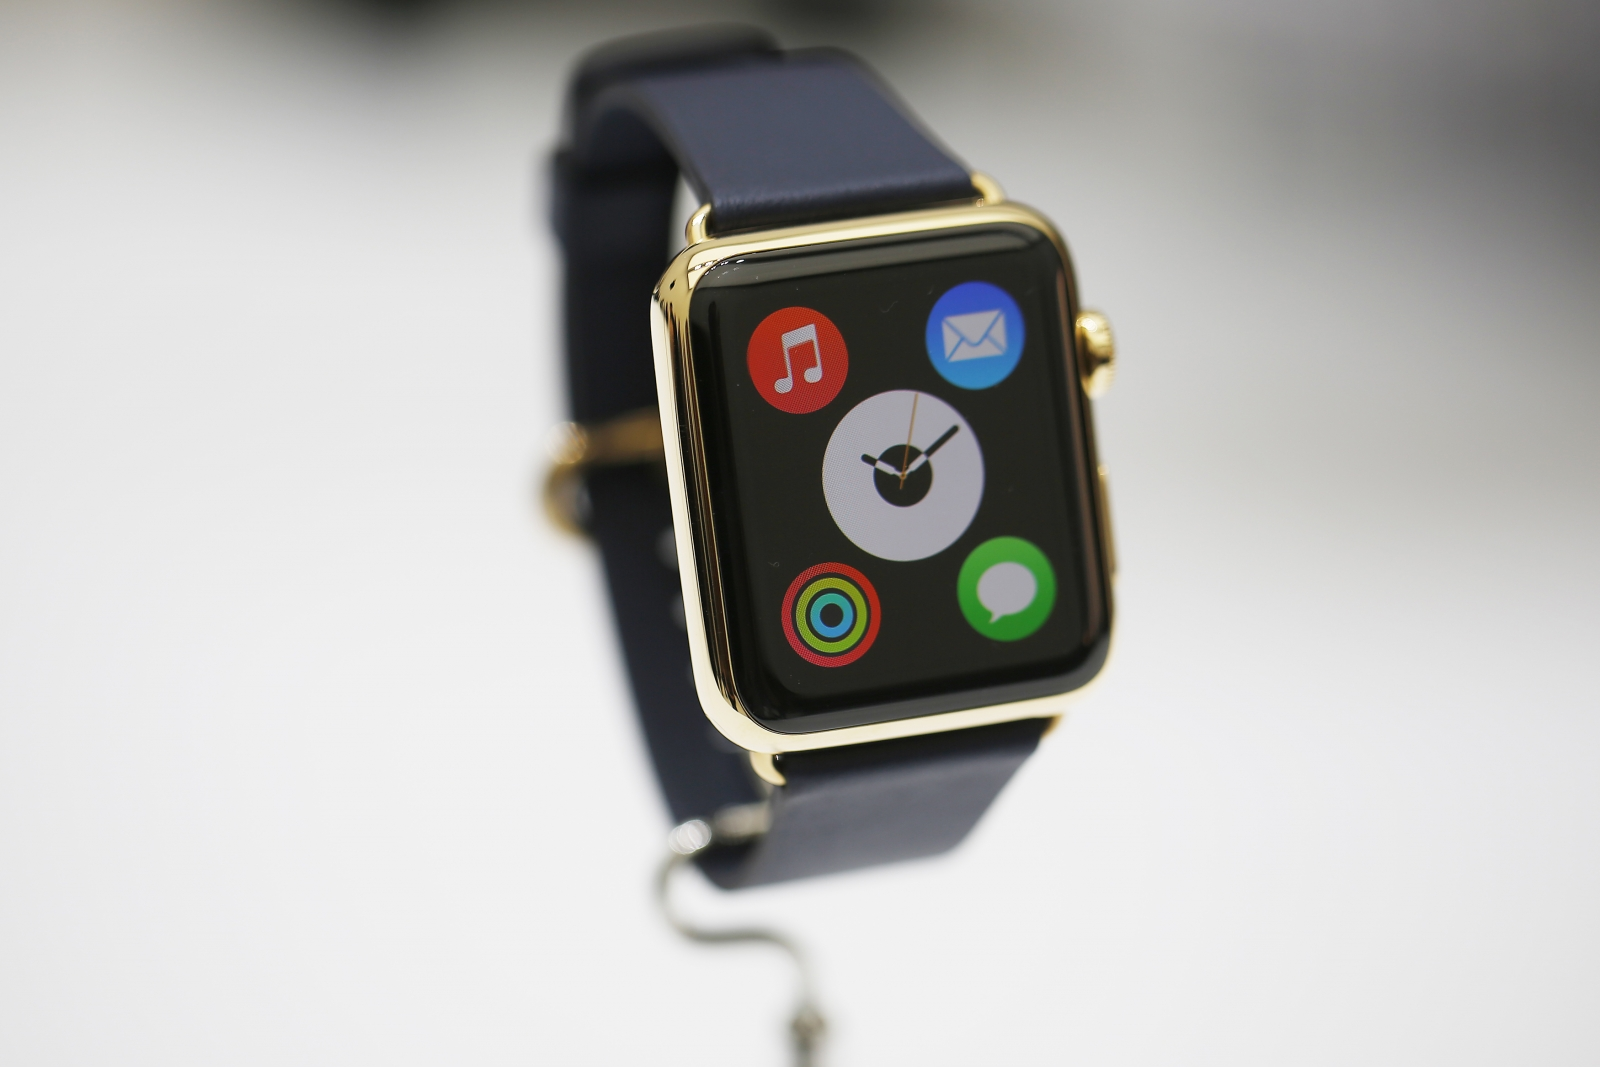 Tech Talk: Apple Watch Highlights Switch from Trend Setter to Market Follower